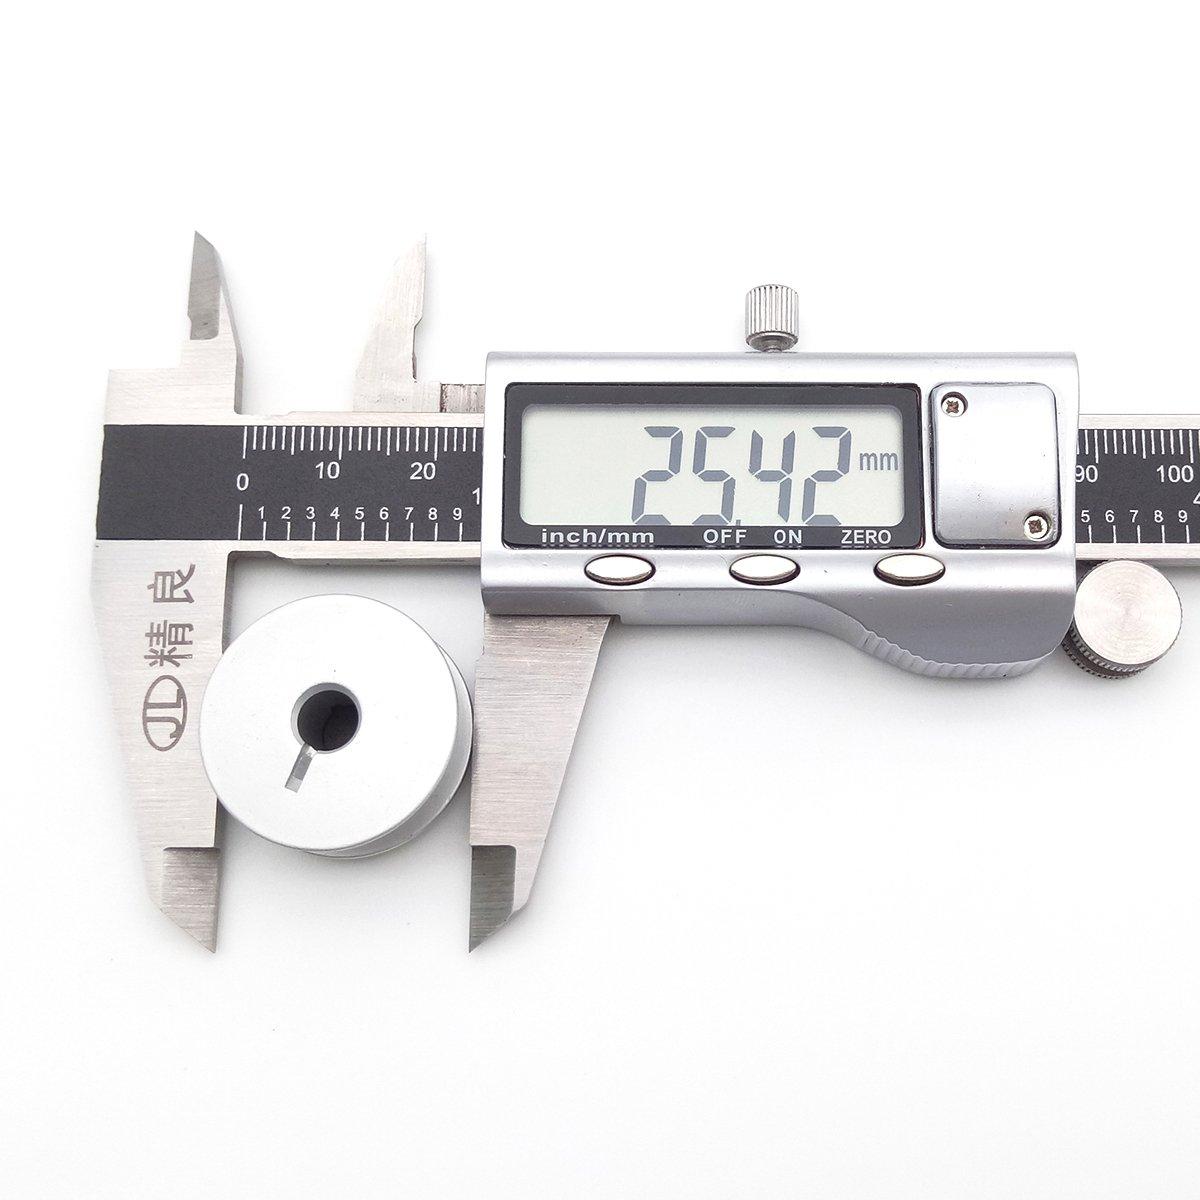 30 Husqvarna Viking Mega Quilter 18x8 Long Arm Quilting Machine,Handi Quilter,GAMMILL TIN LIZZIE QUILTER 30 pcs Aluminum Bobbins With Slot FIT For PFAFF QUILTER